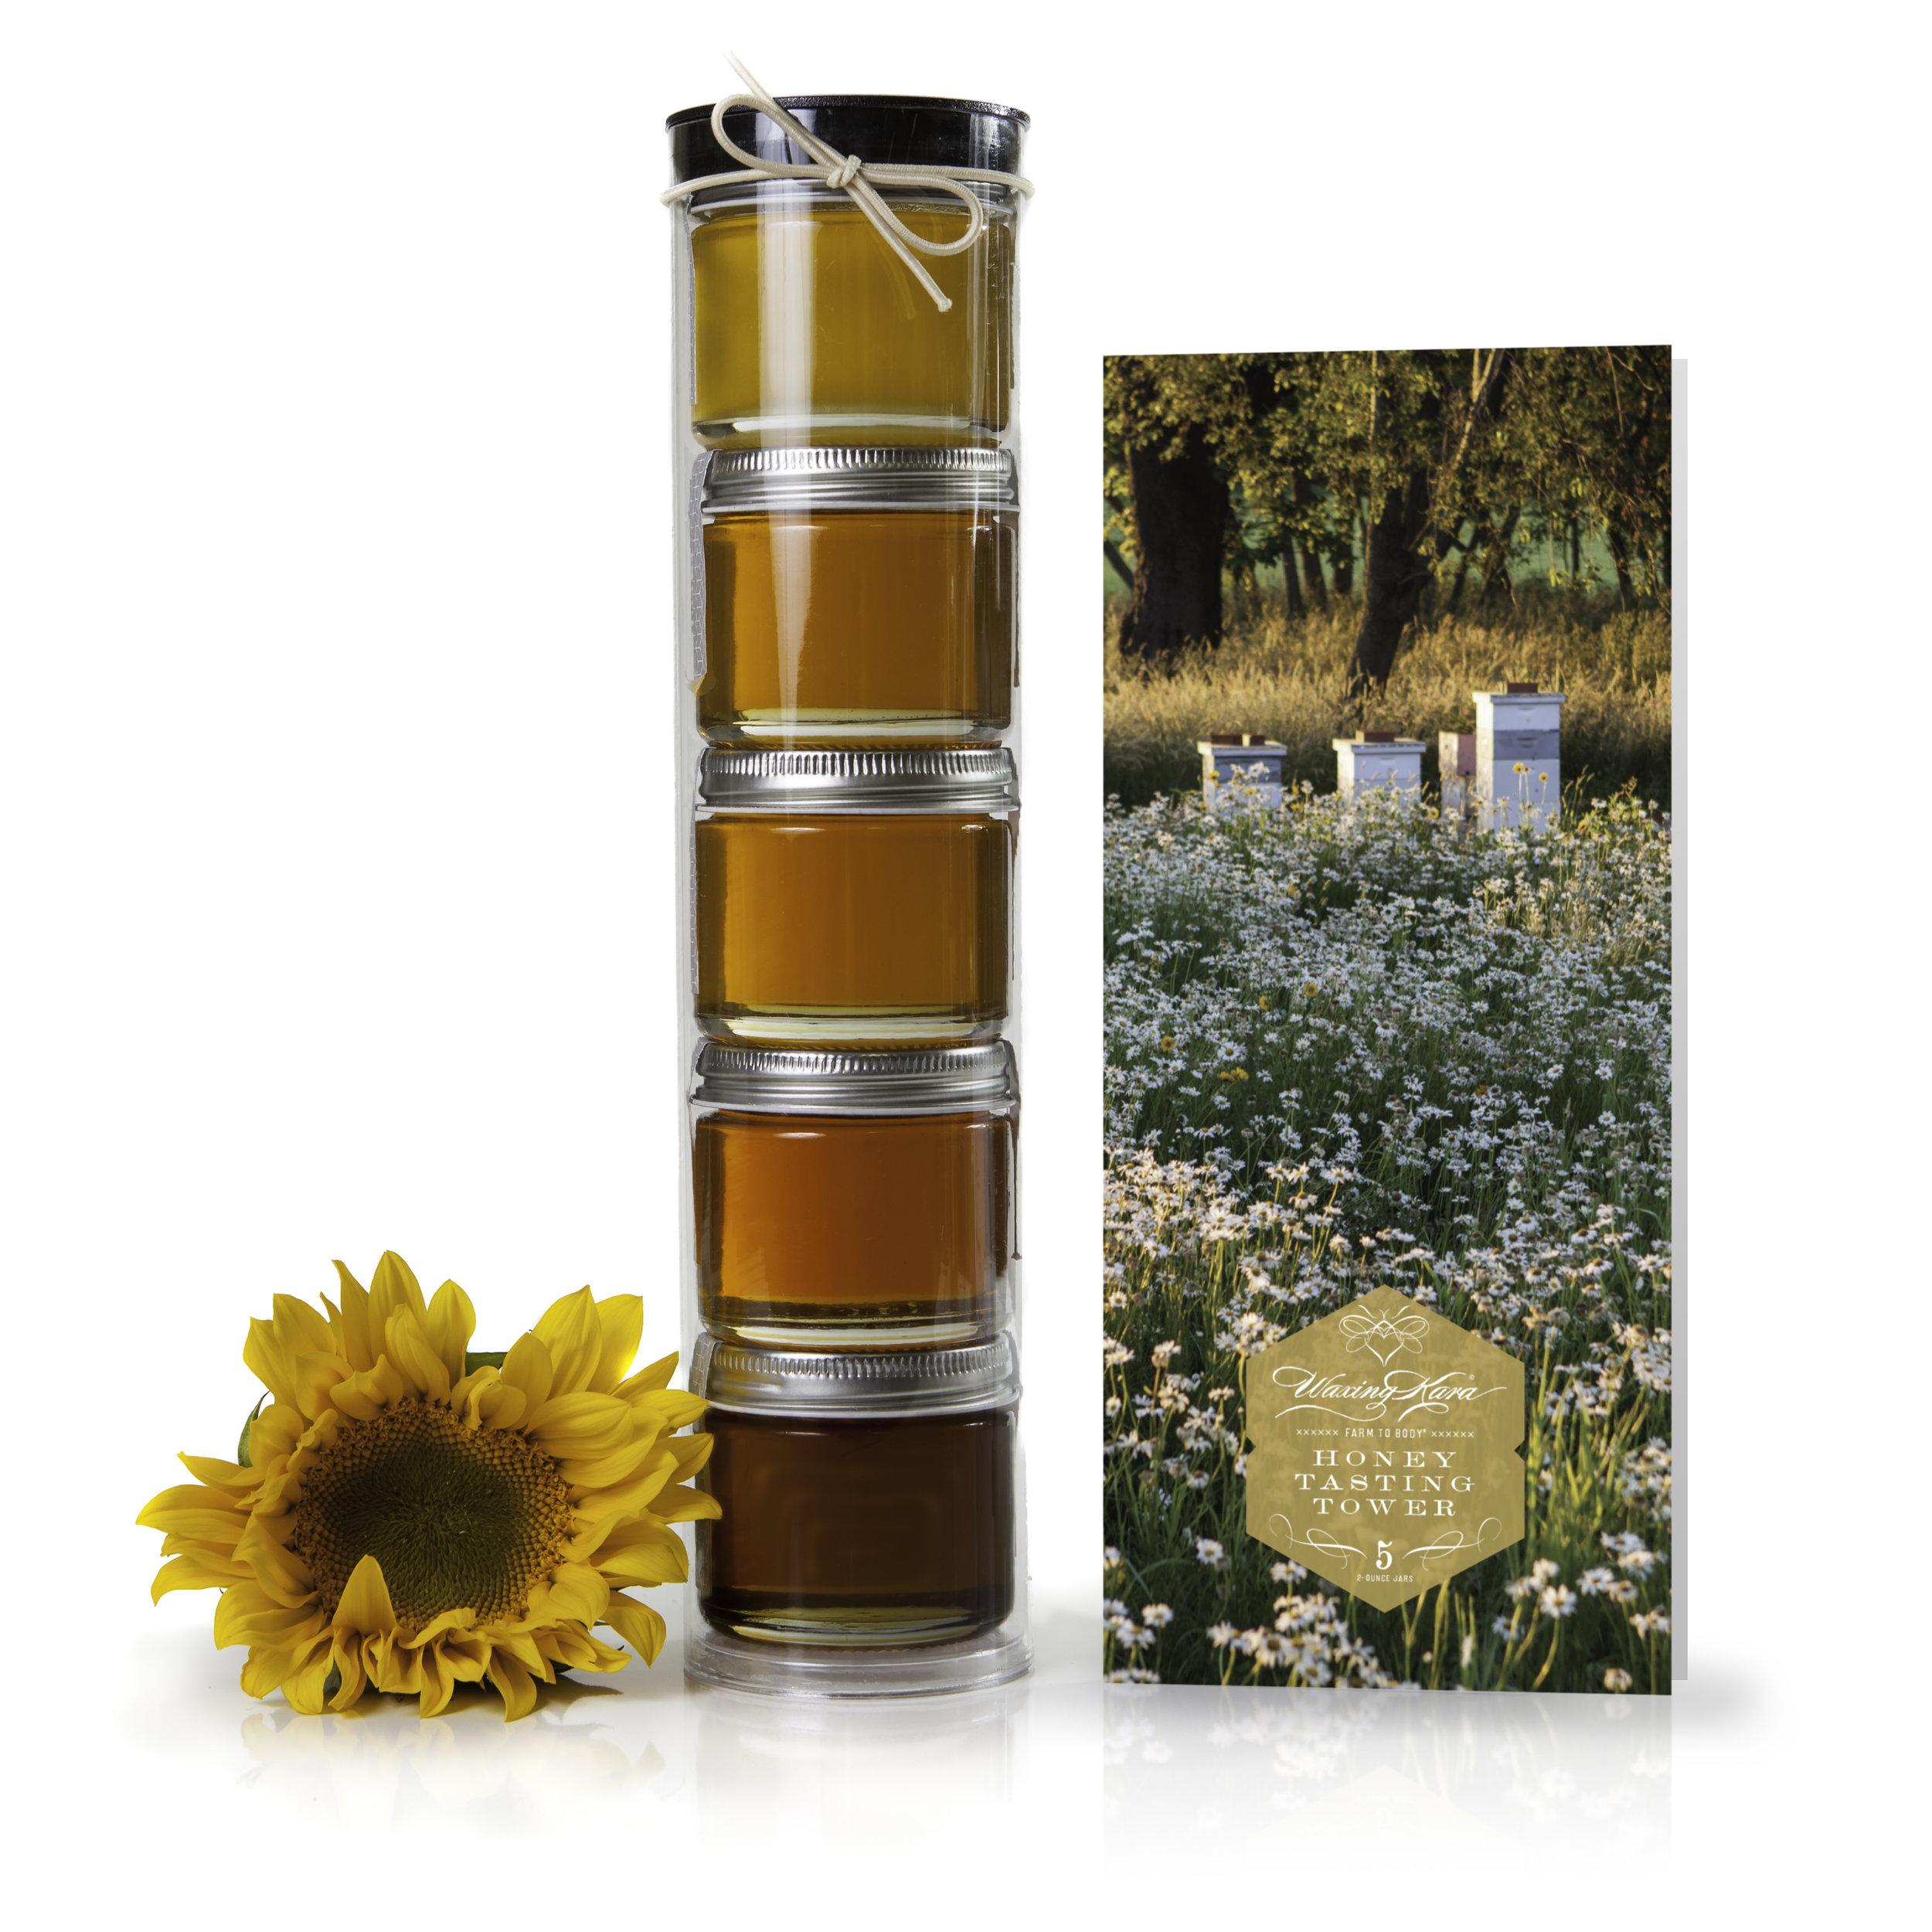 Waxing Kara Honey Tasting Tower